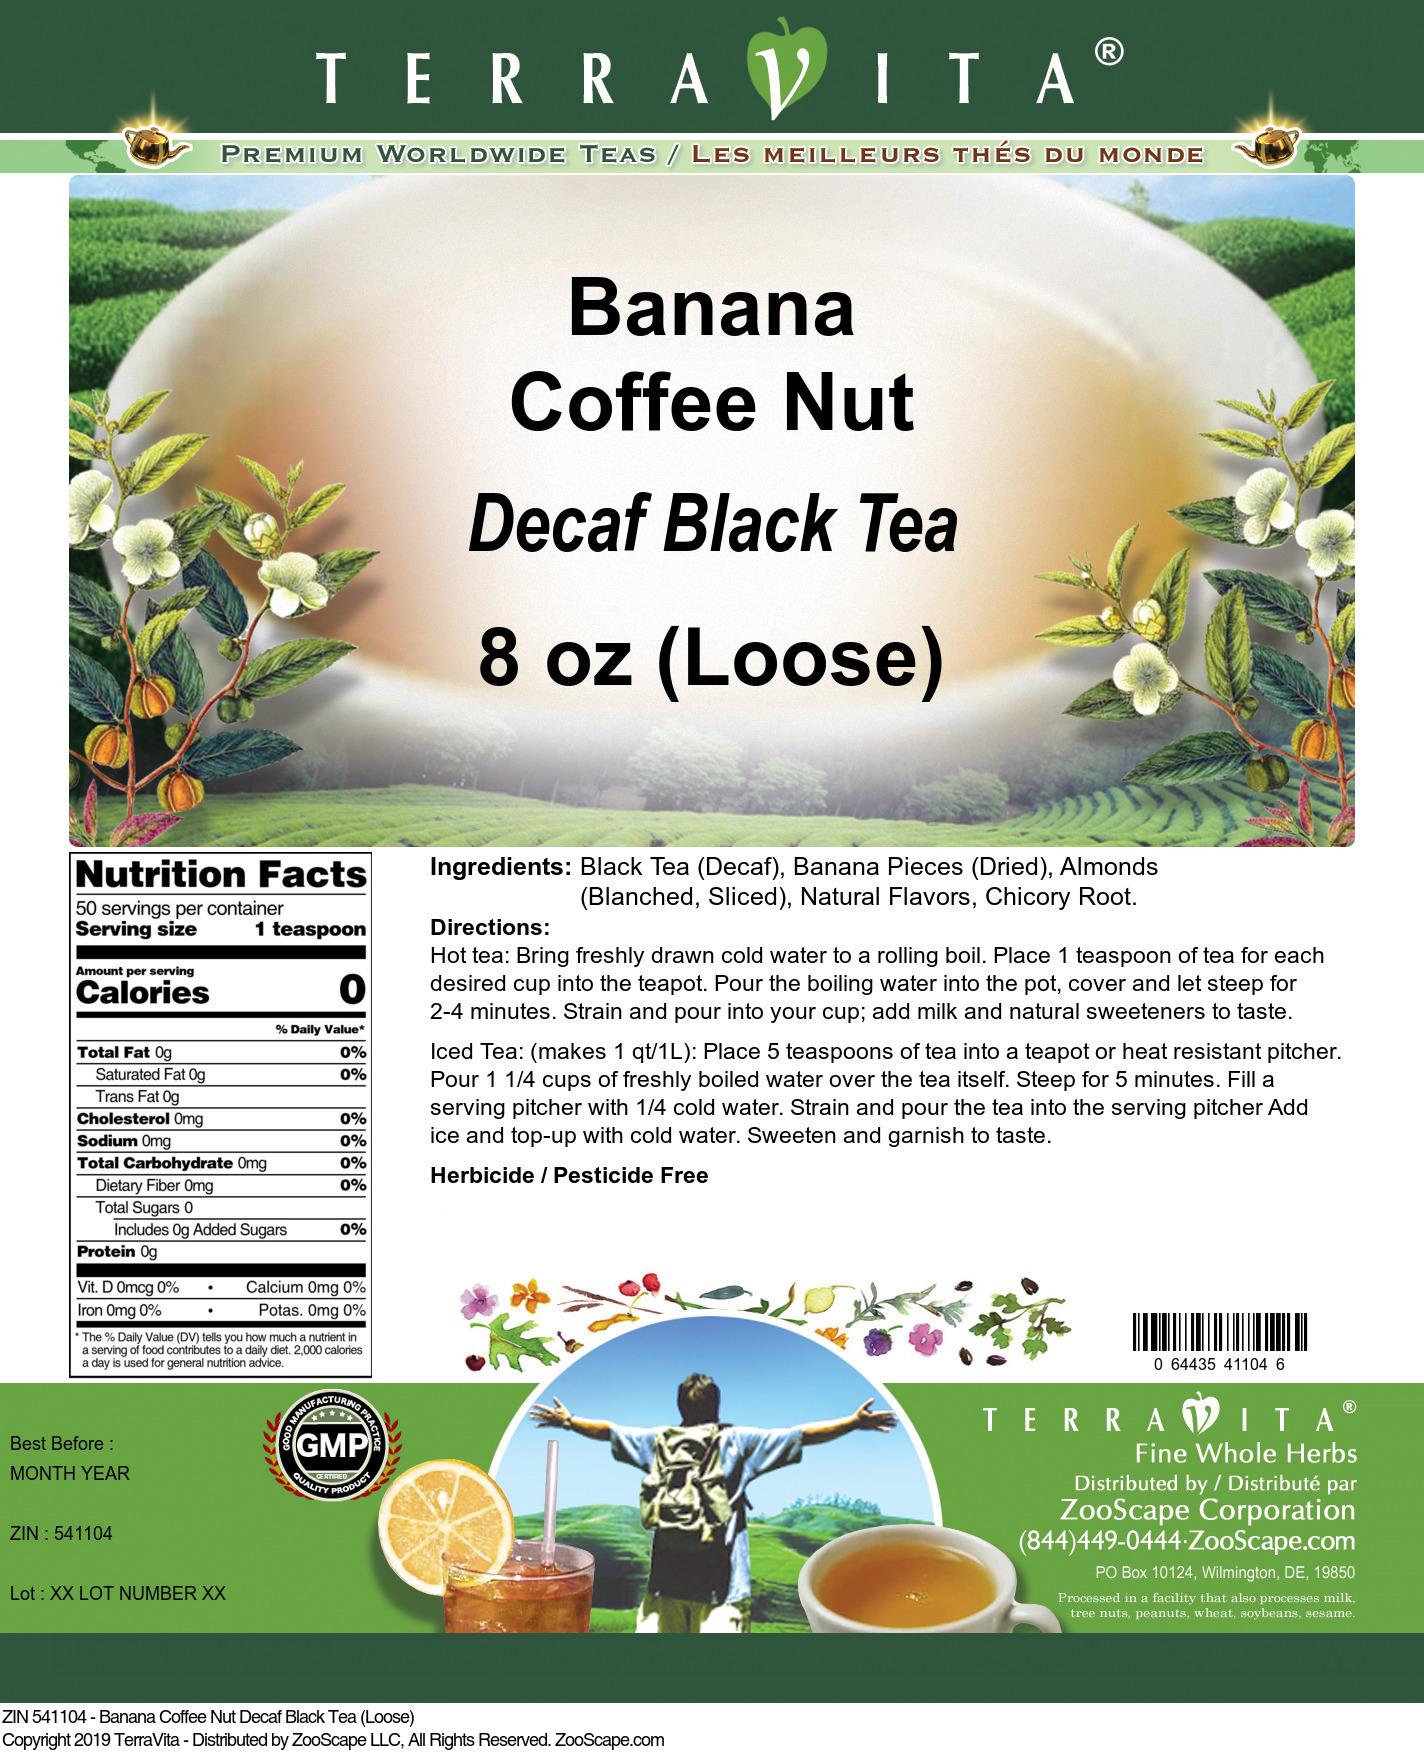 Banana Coffee Nut Decaf Black Tea (Loose)